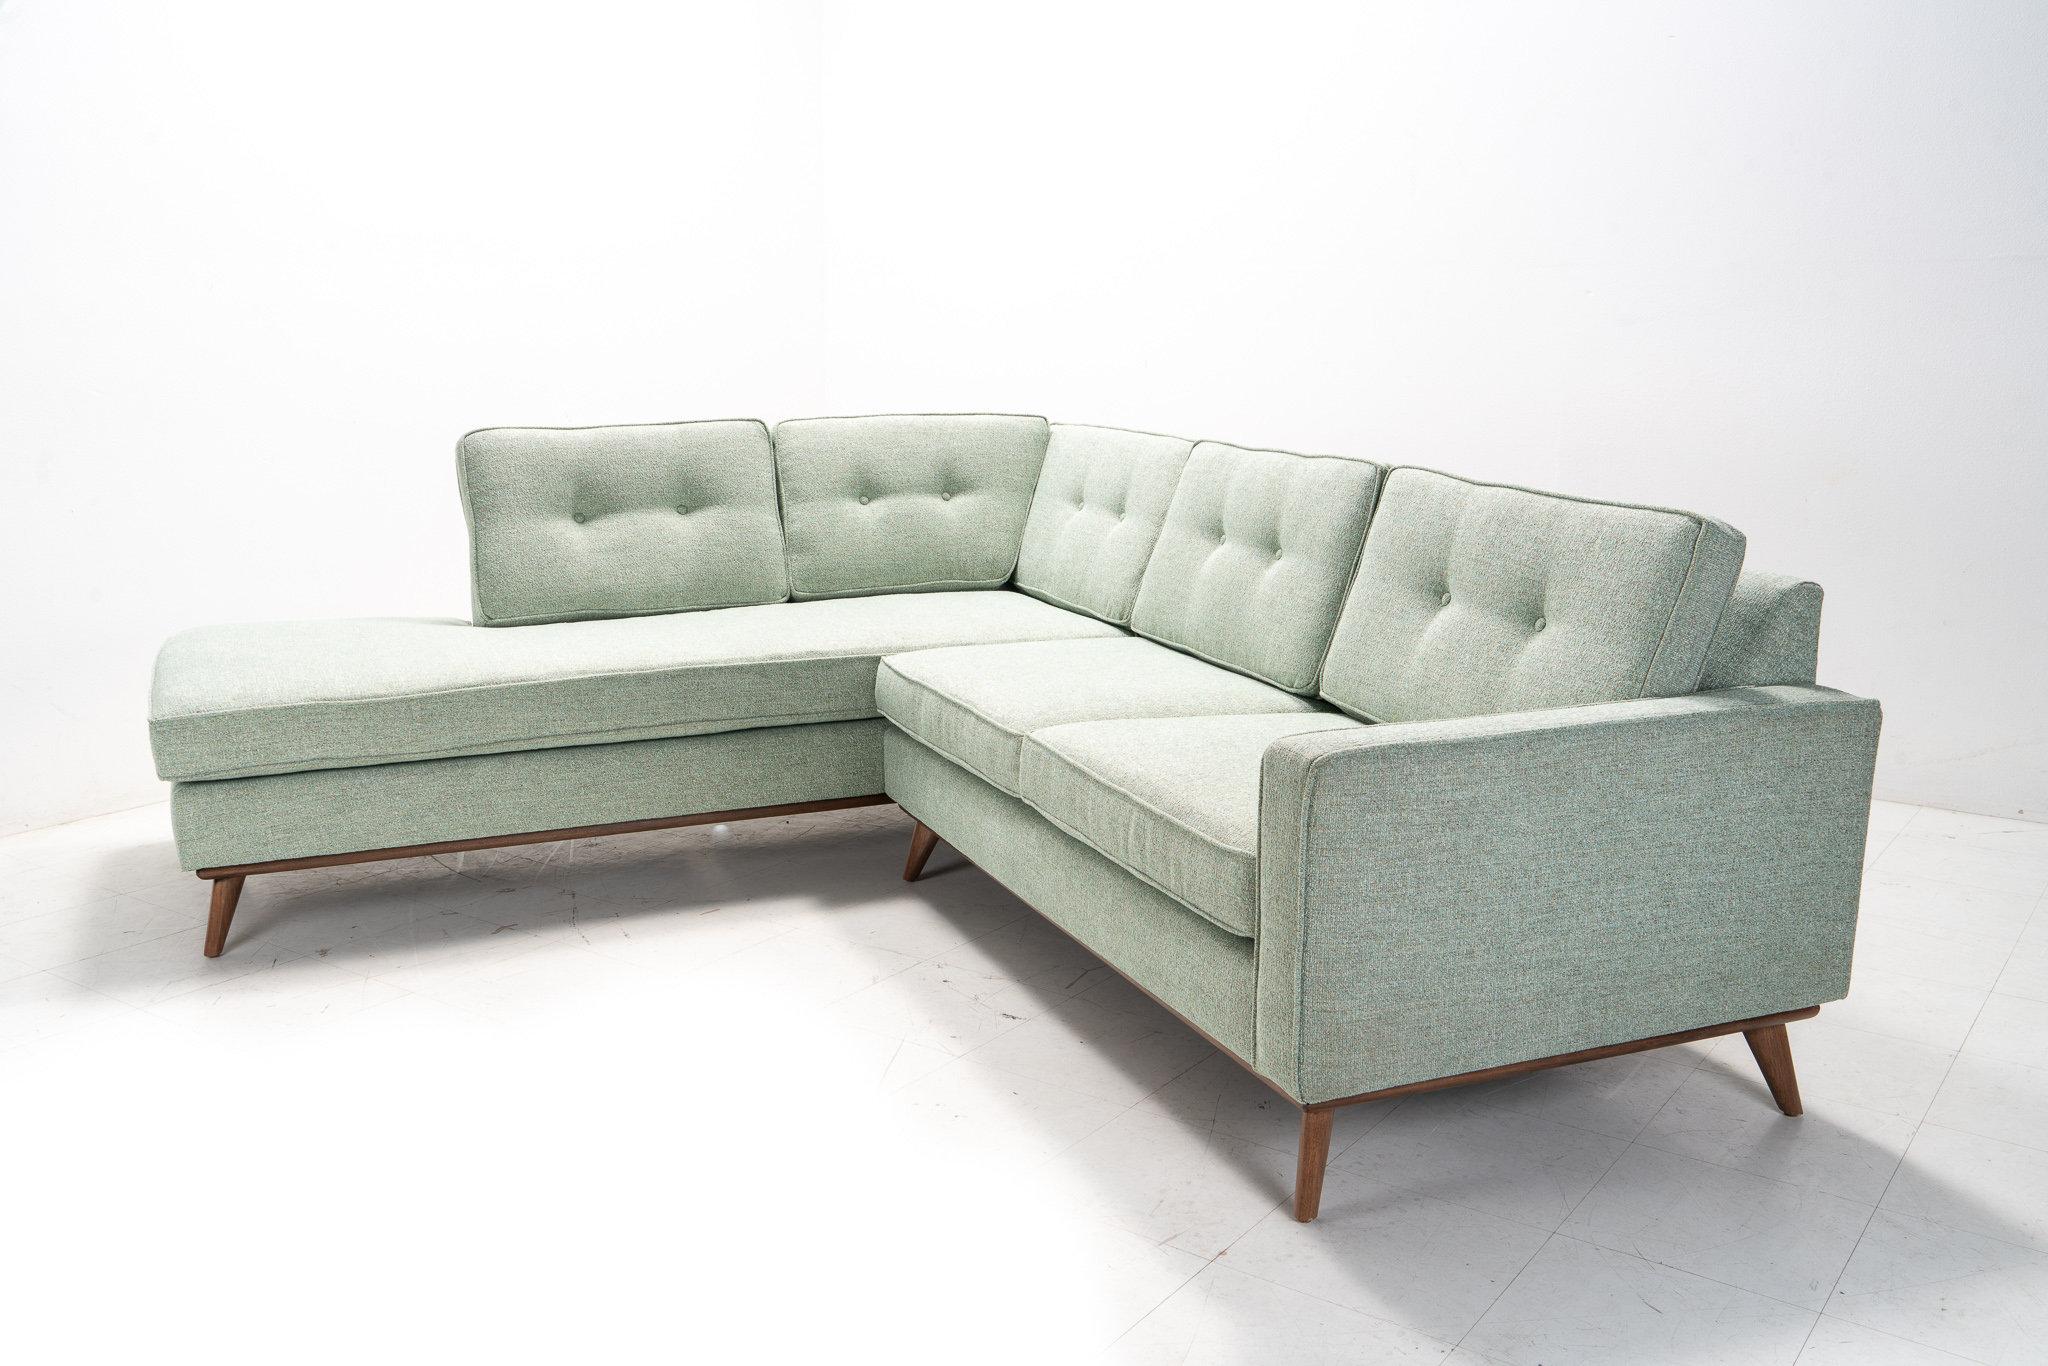 Mid Century Danish Modern Sectional Chaise Sofa | Etsy